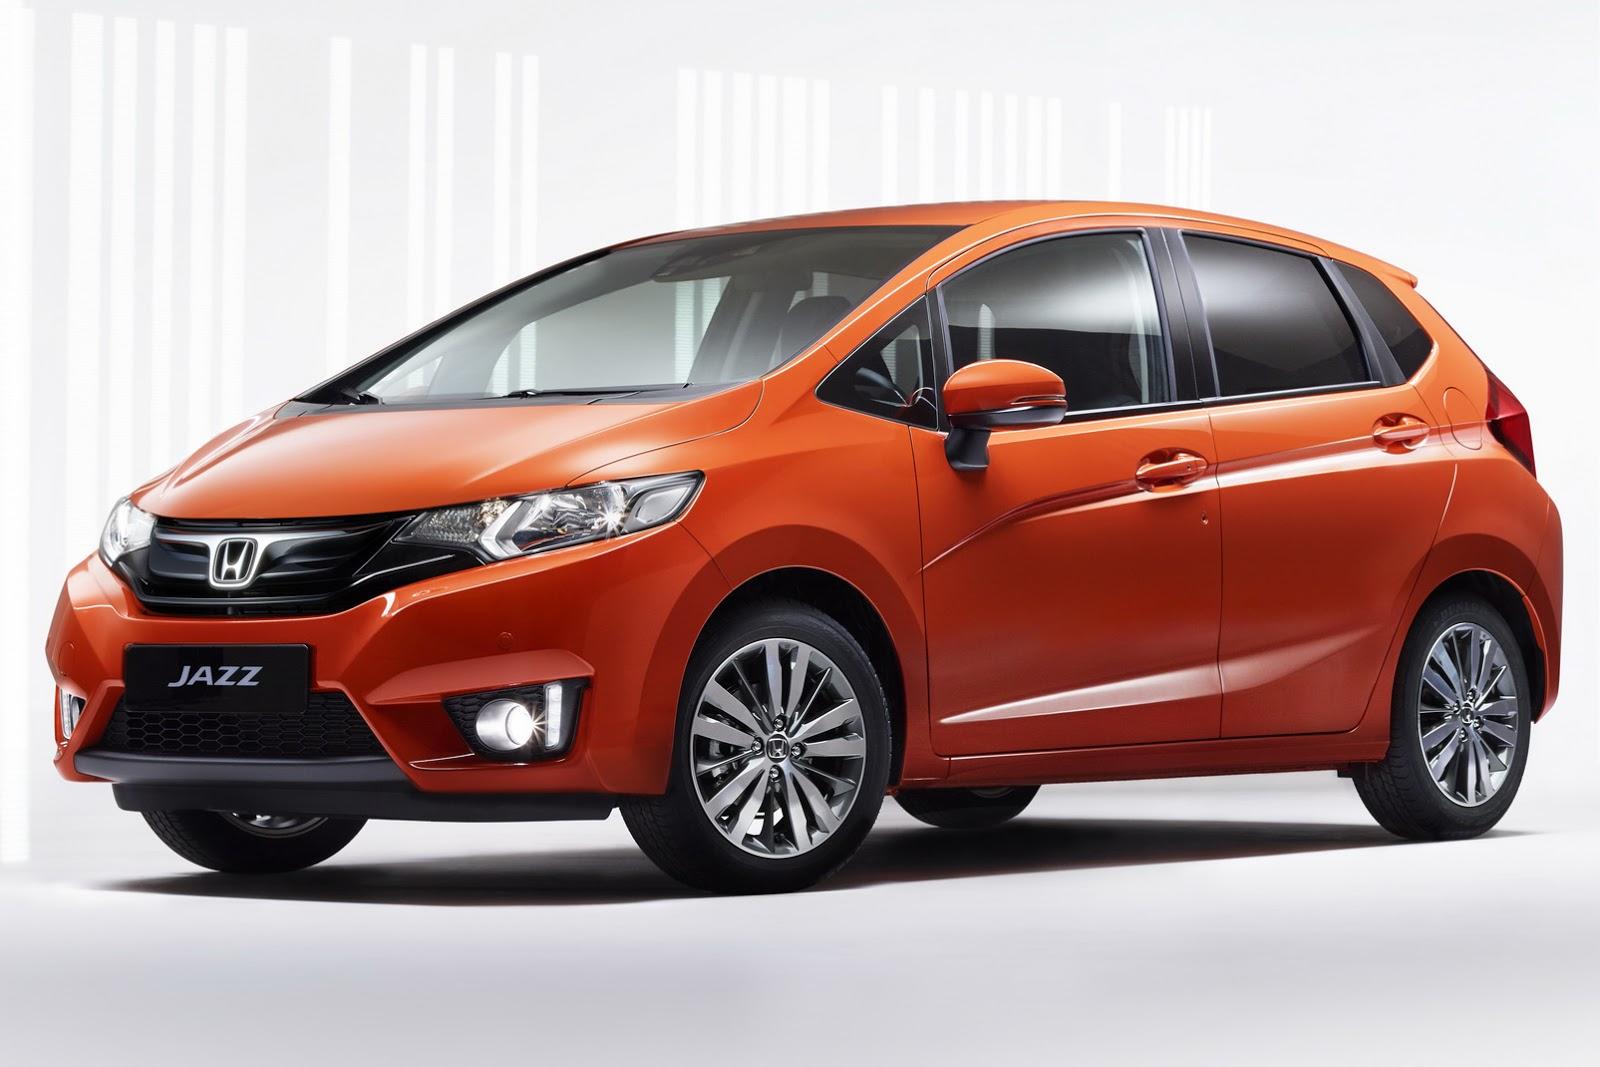 2022 Honda Civic prototype debuts, previews 11th gen